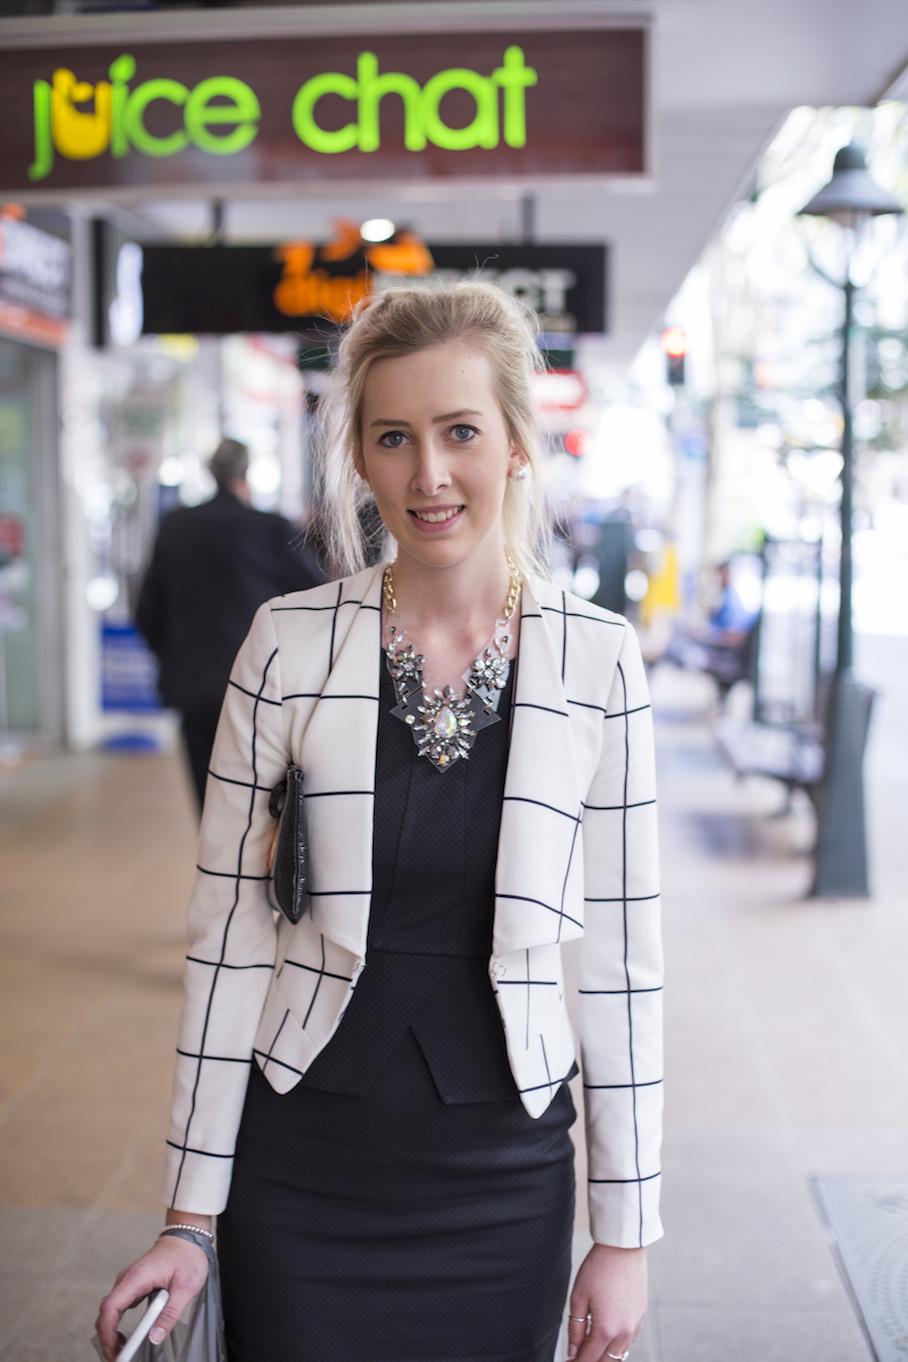 Qld: Demi Johnson, Paralegal, Adelaide St, Brisbane. Photo: Jessica Baker.